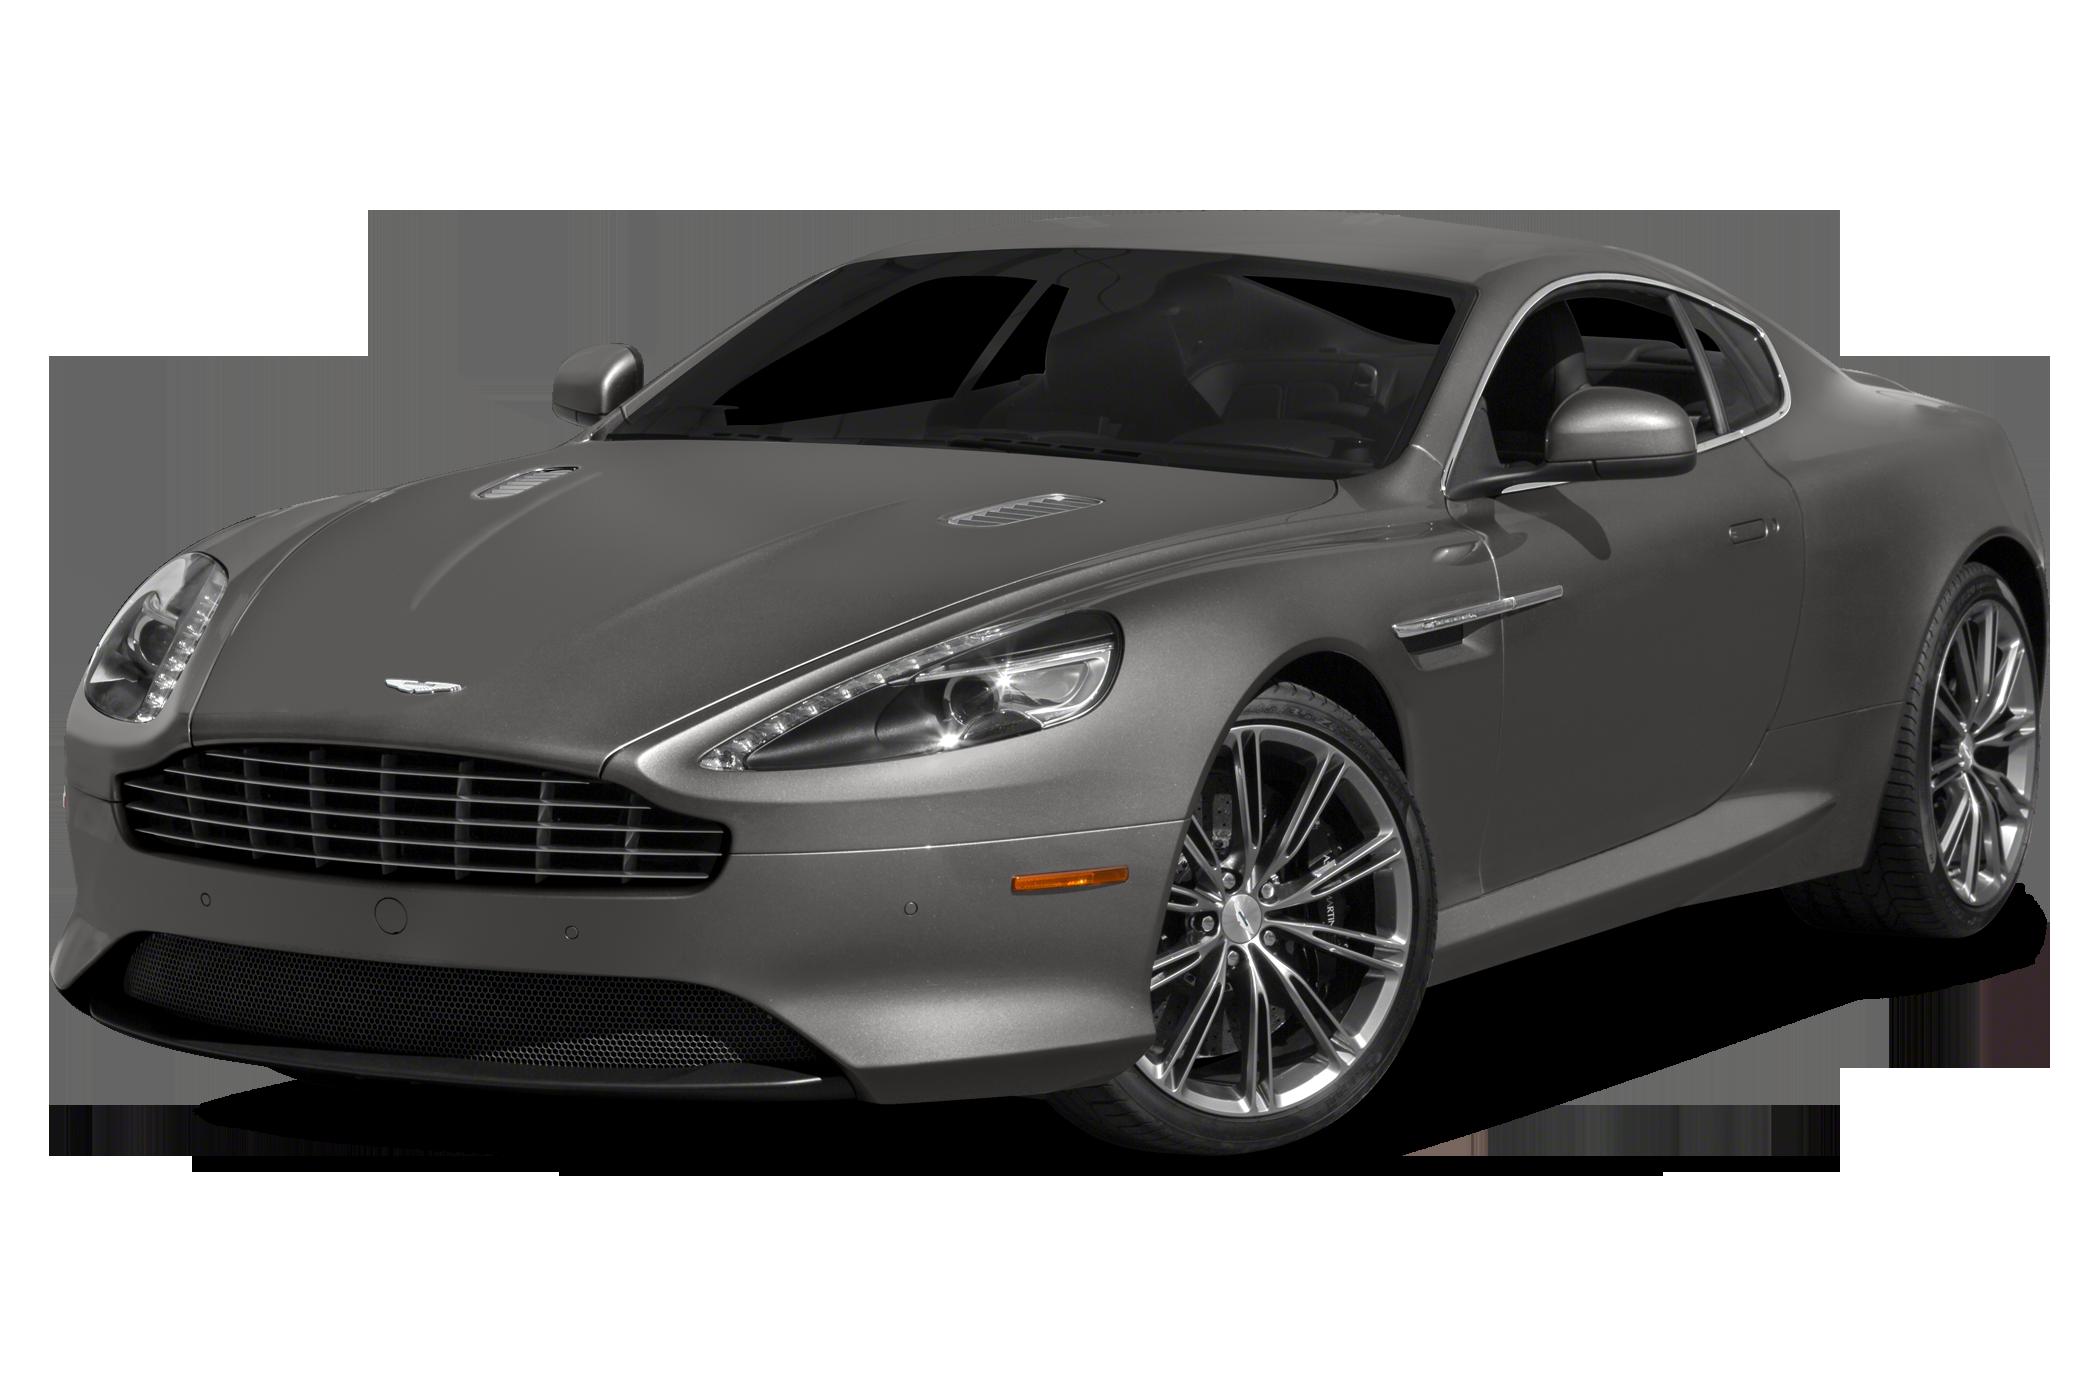 Free Aston Martin PNG Transparent Images, Download Free